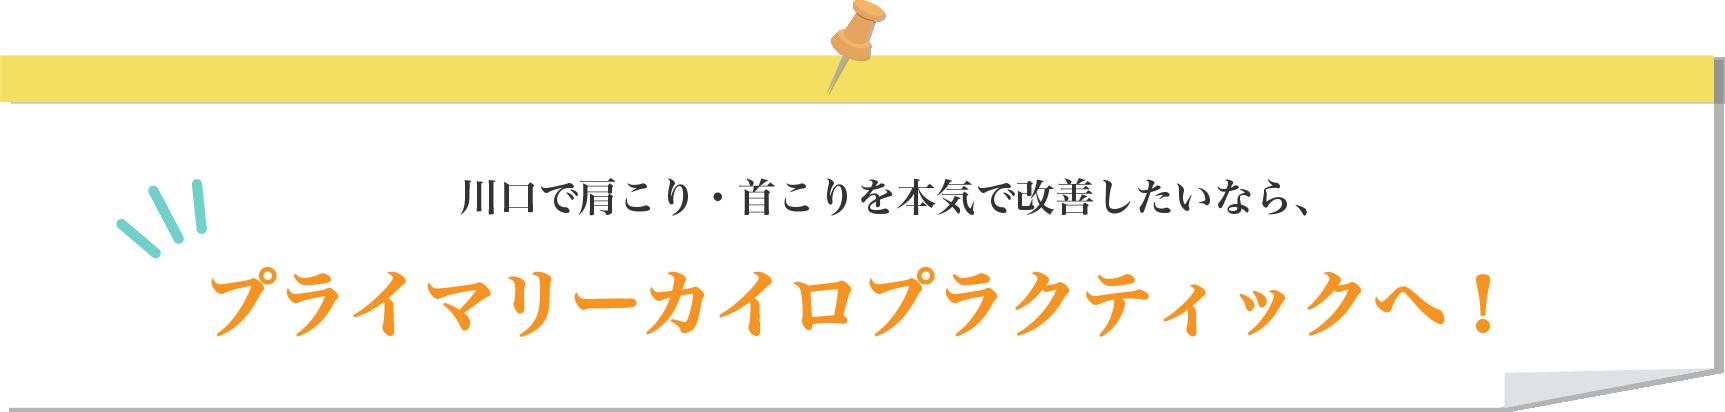 sozai27 - 当施設紹介